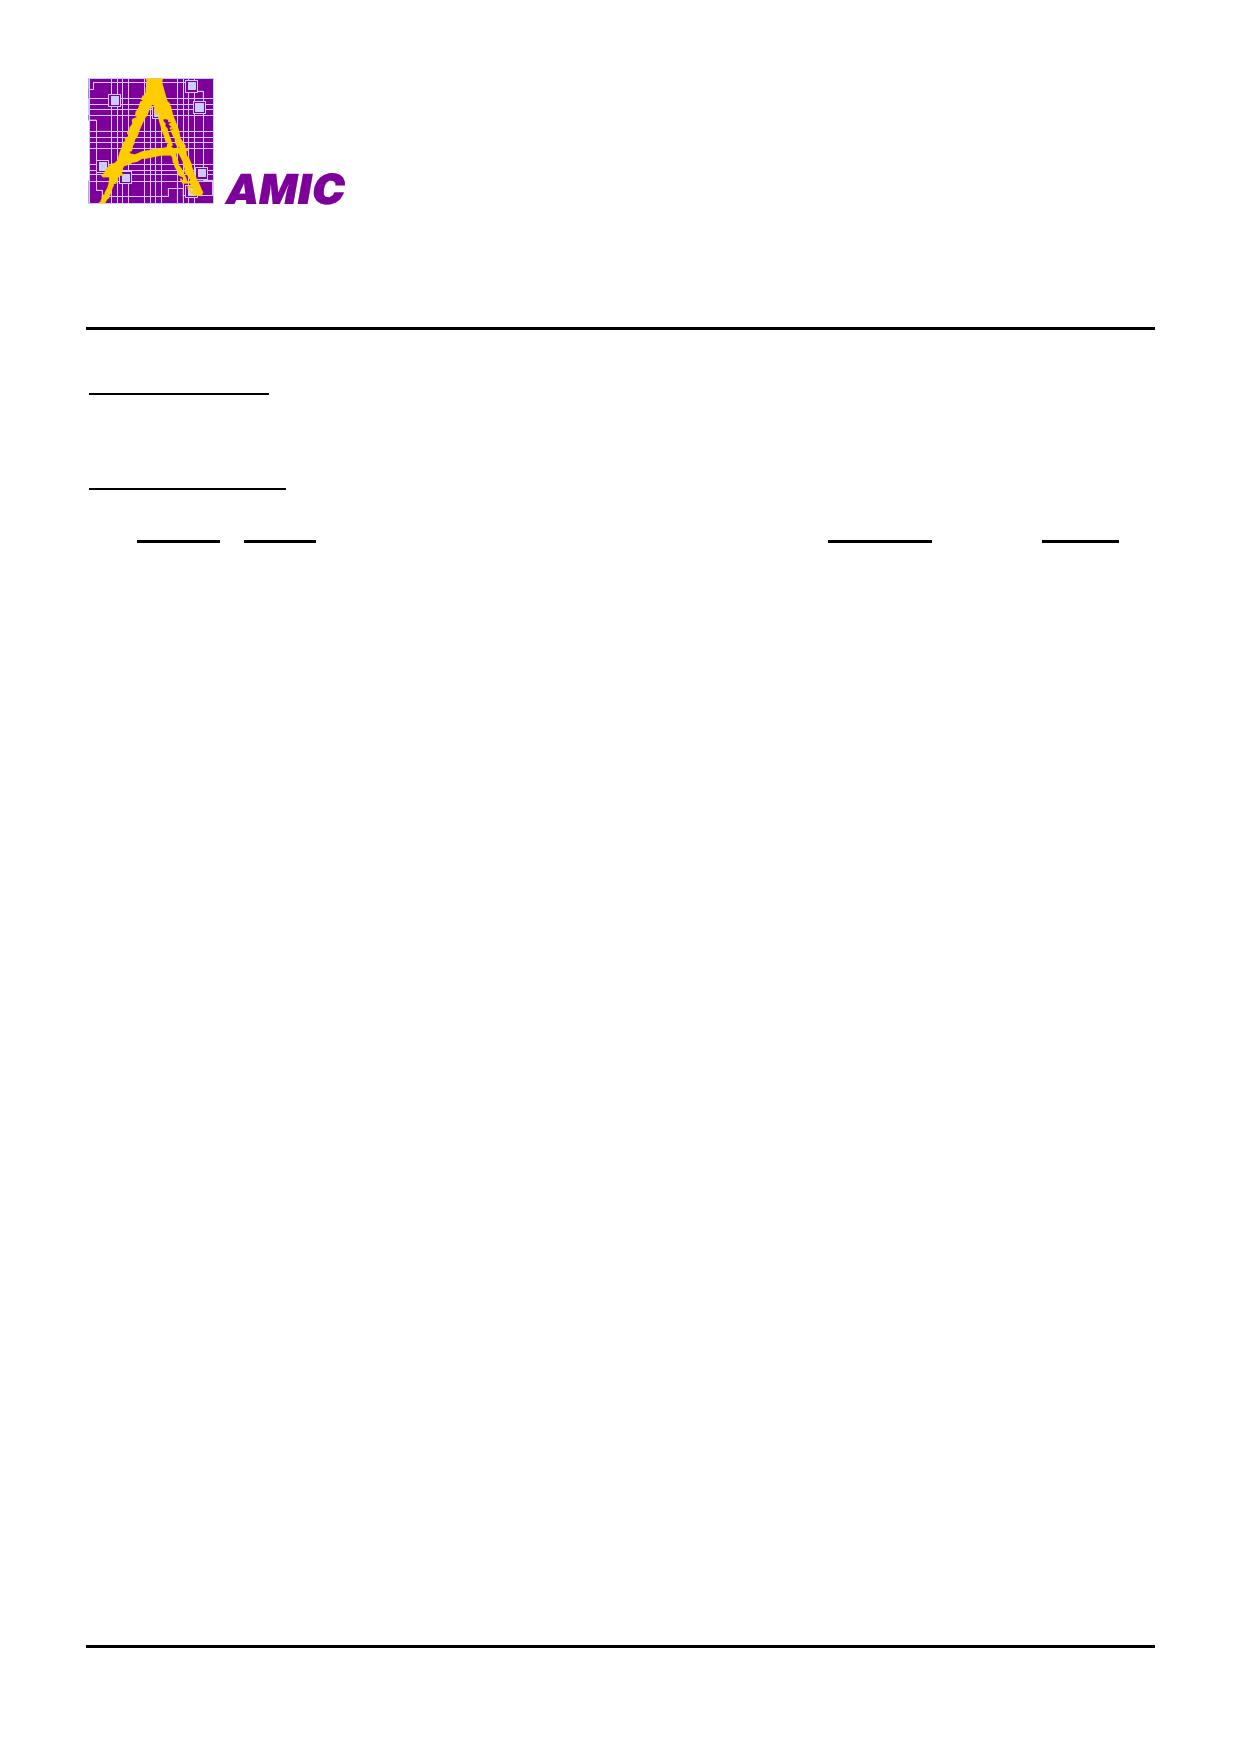 A25L16P datasheet, circuit